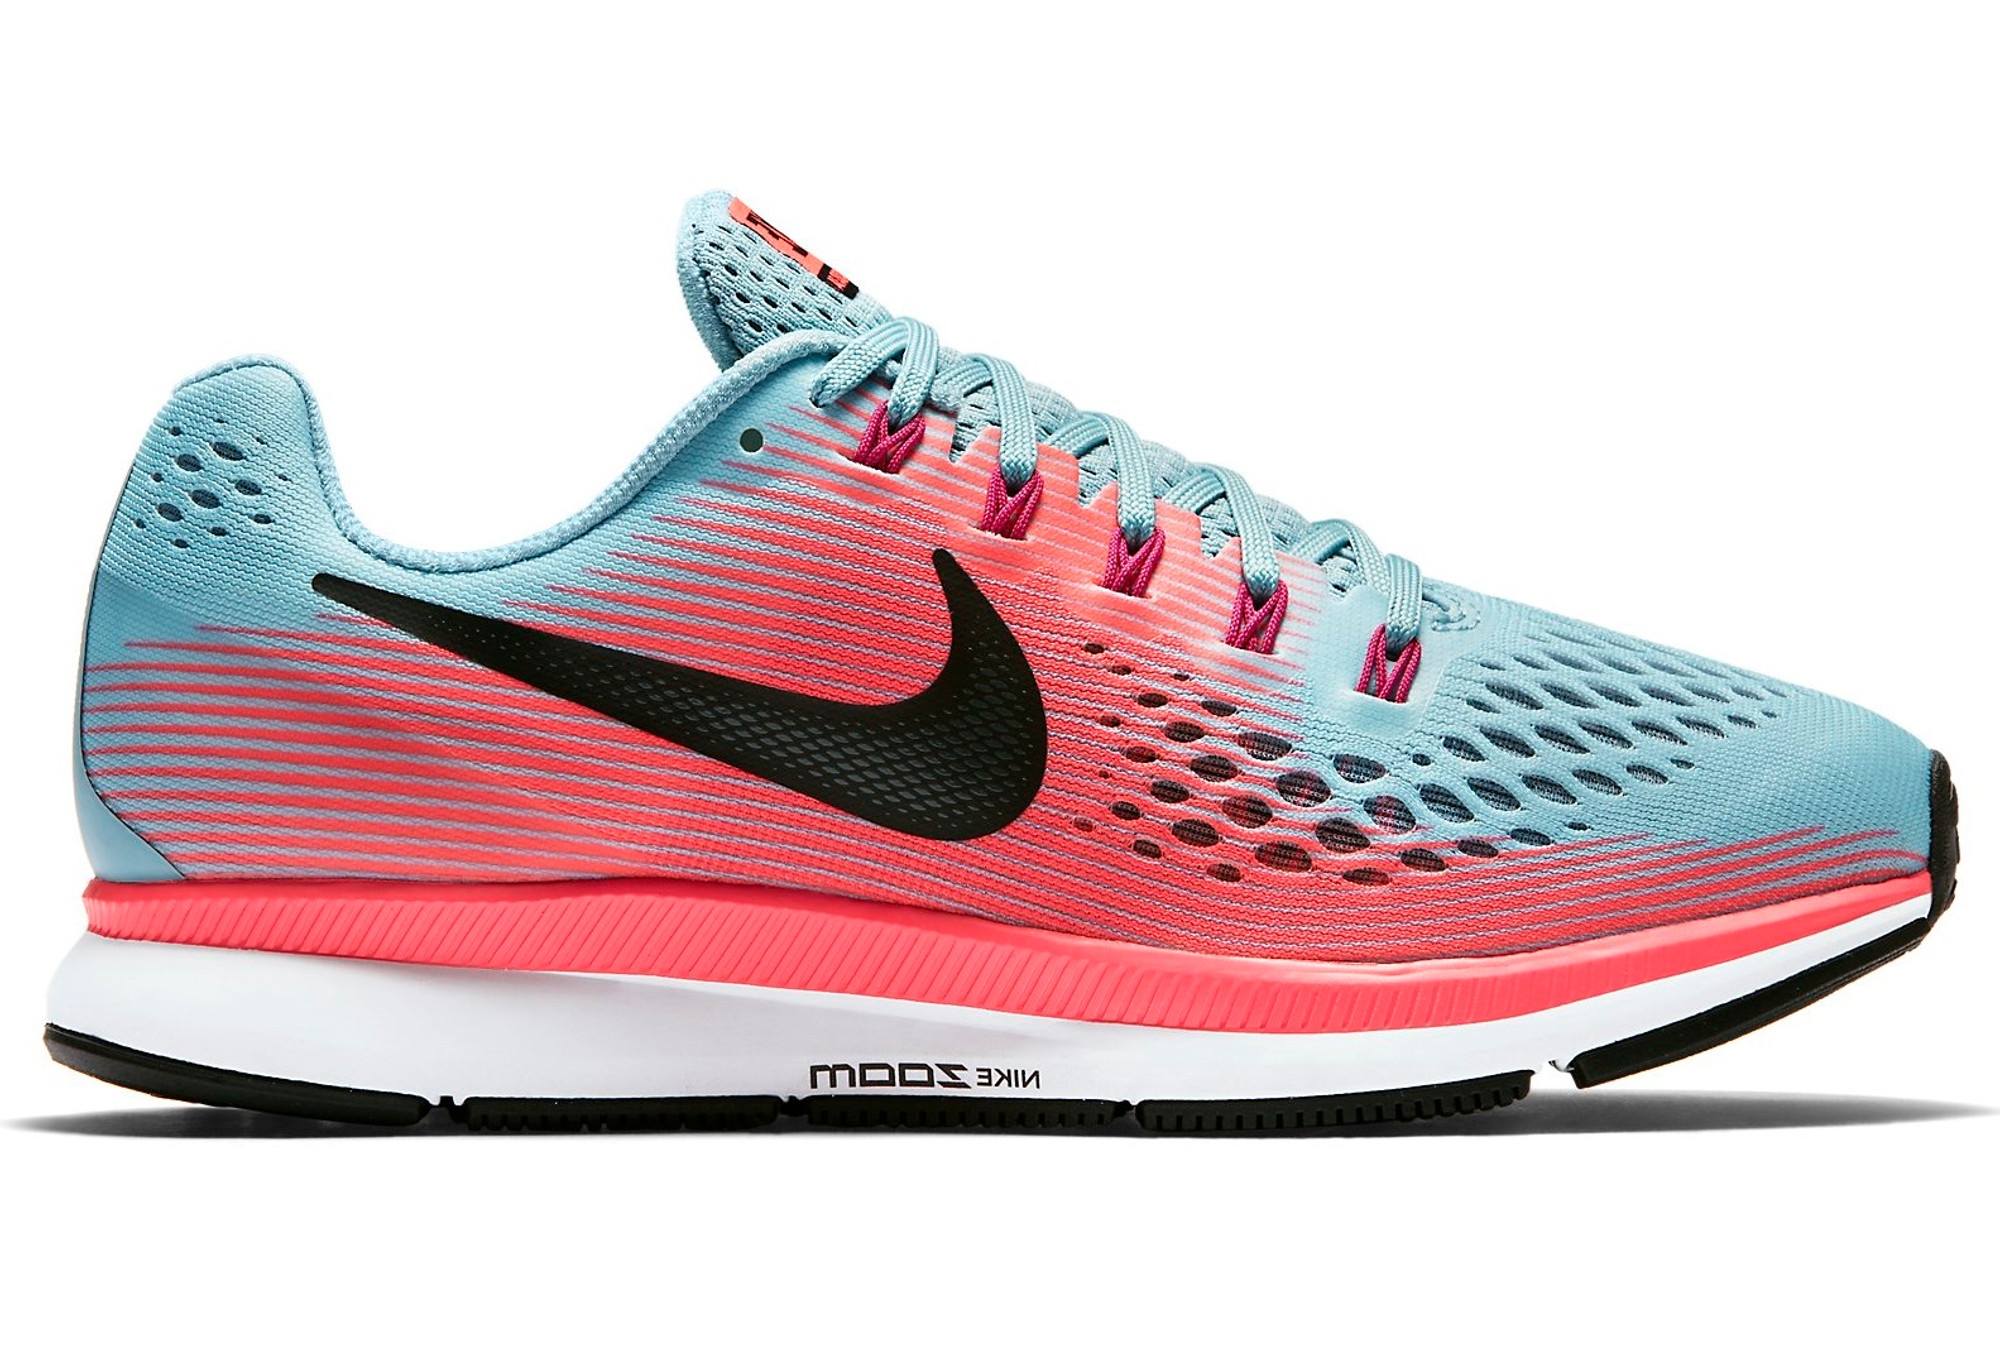 reputable site 4400e 79ee5 Chaussures de Running Femme Nike Air Zoom Pegasus 34 Bleu   Rose